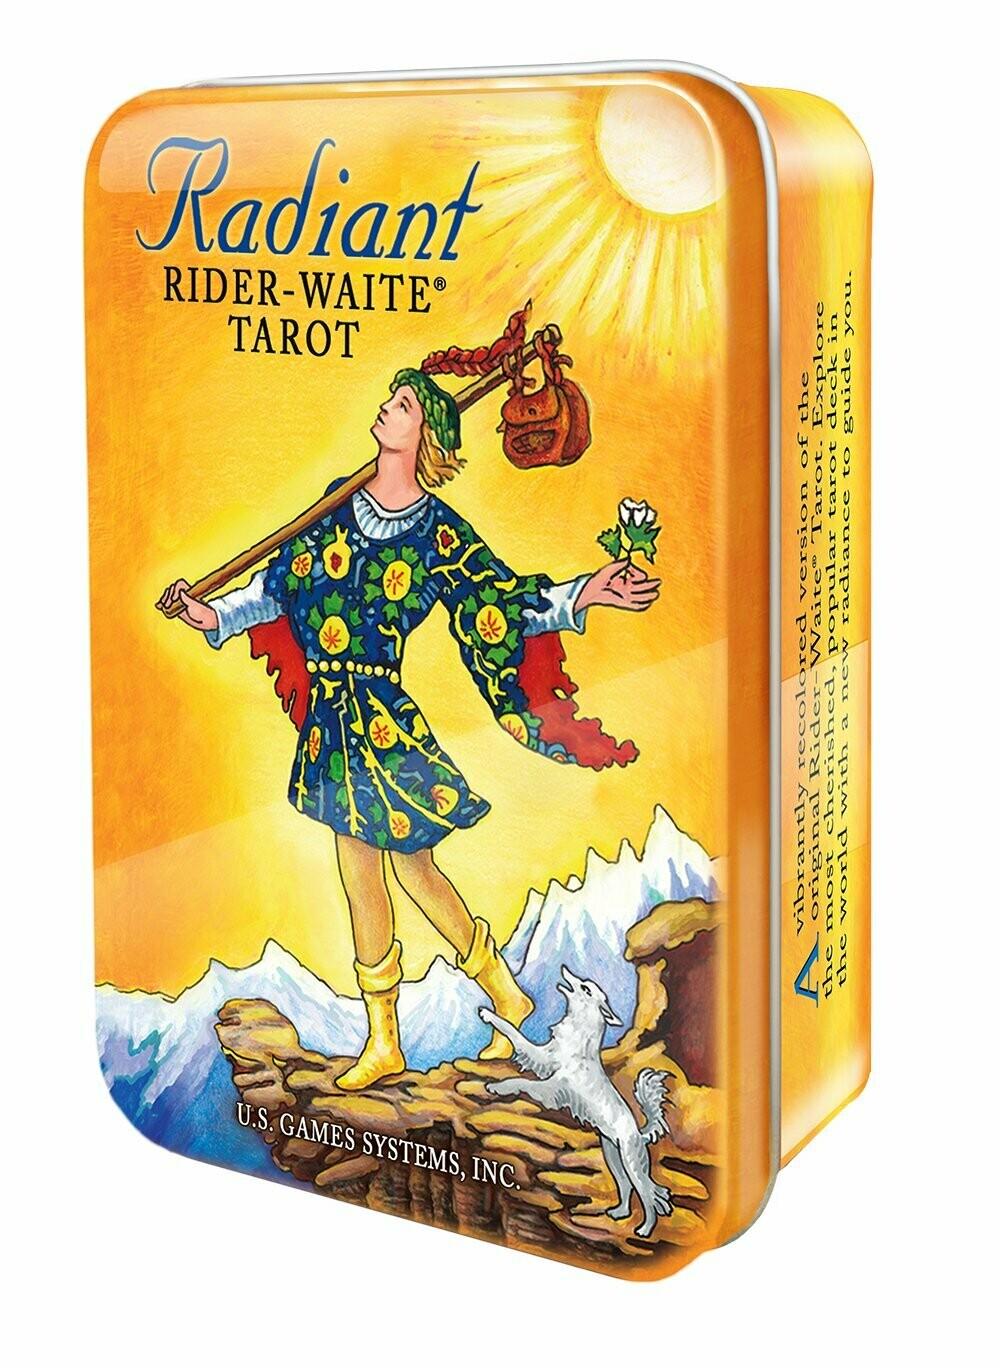 Radiant Rider-Waite Tarot tin